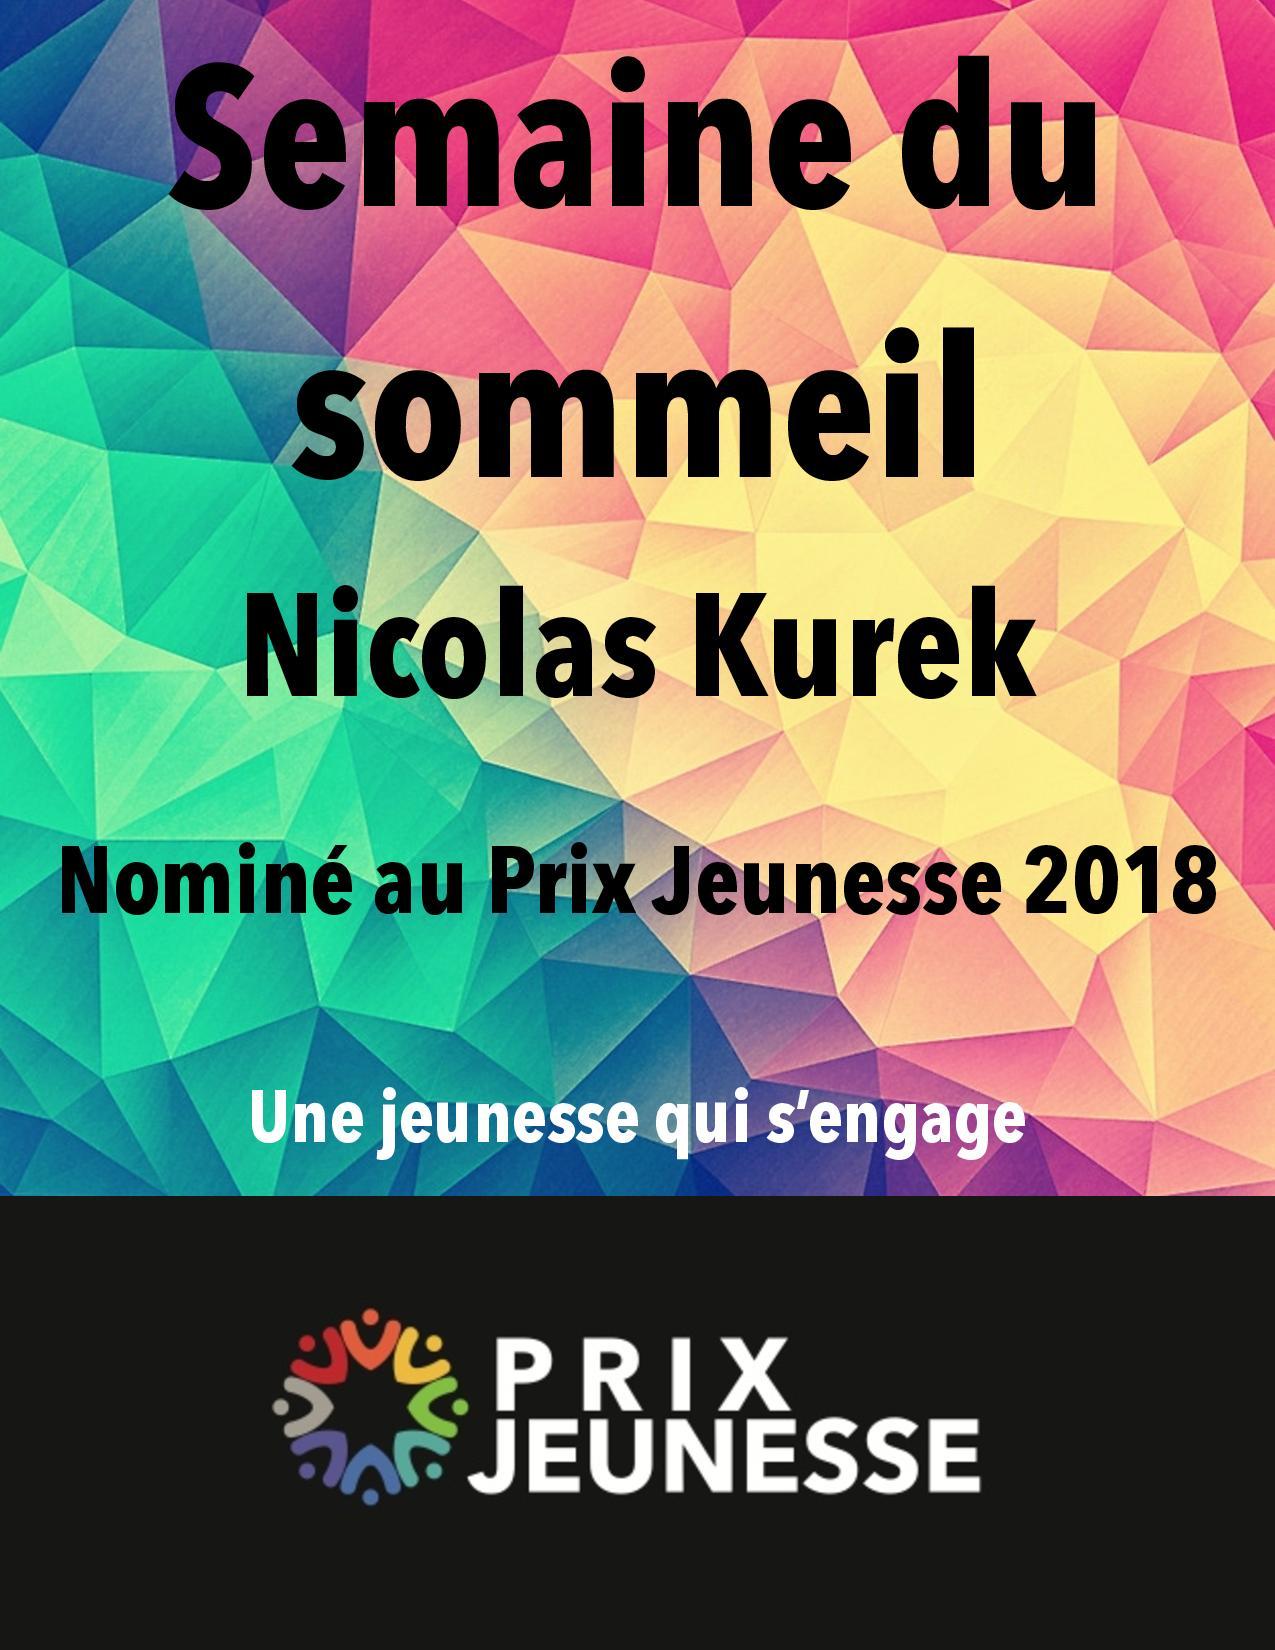 Candidat  Semaine du Sommeil - Nicolas Kurek